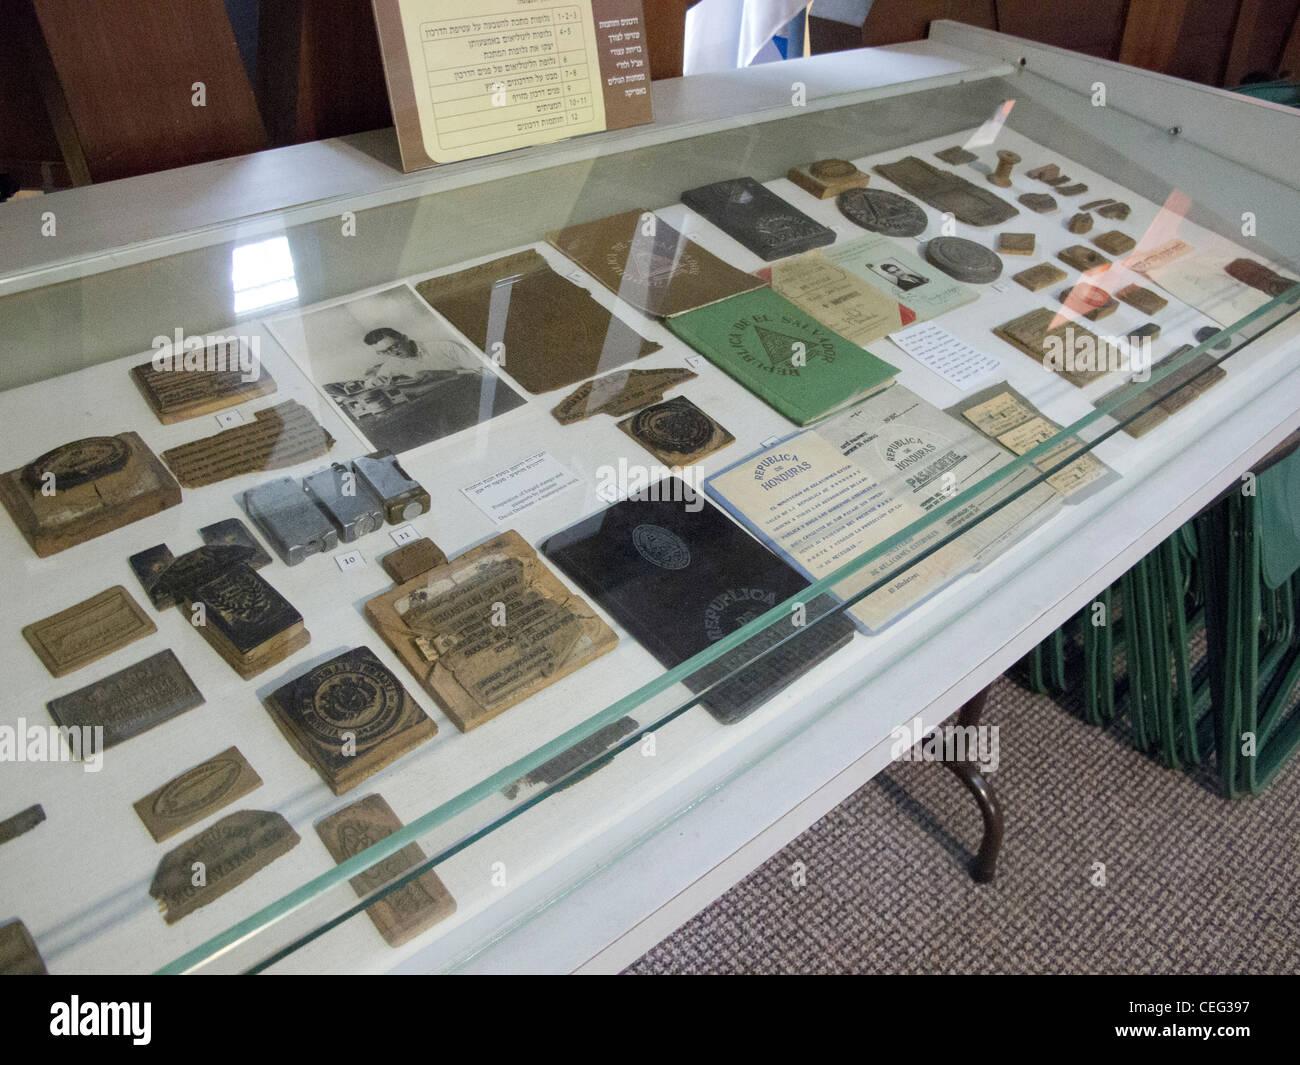 Tel Aviv,Zeev Jabotinsky,Zionist museum Stock Photo